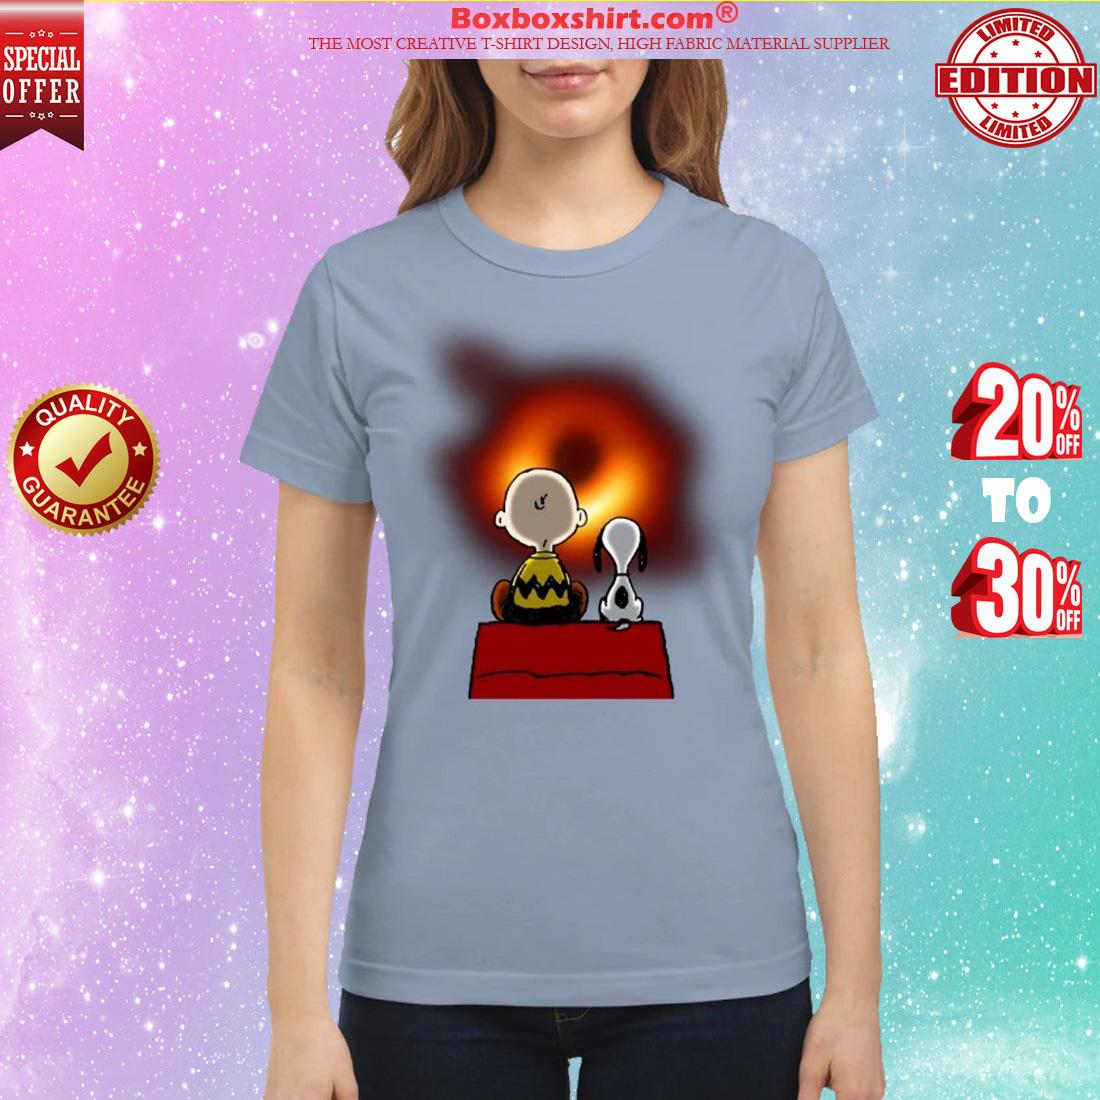 Snoopy Charlie Brown NASA black hole classic shirt